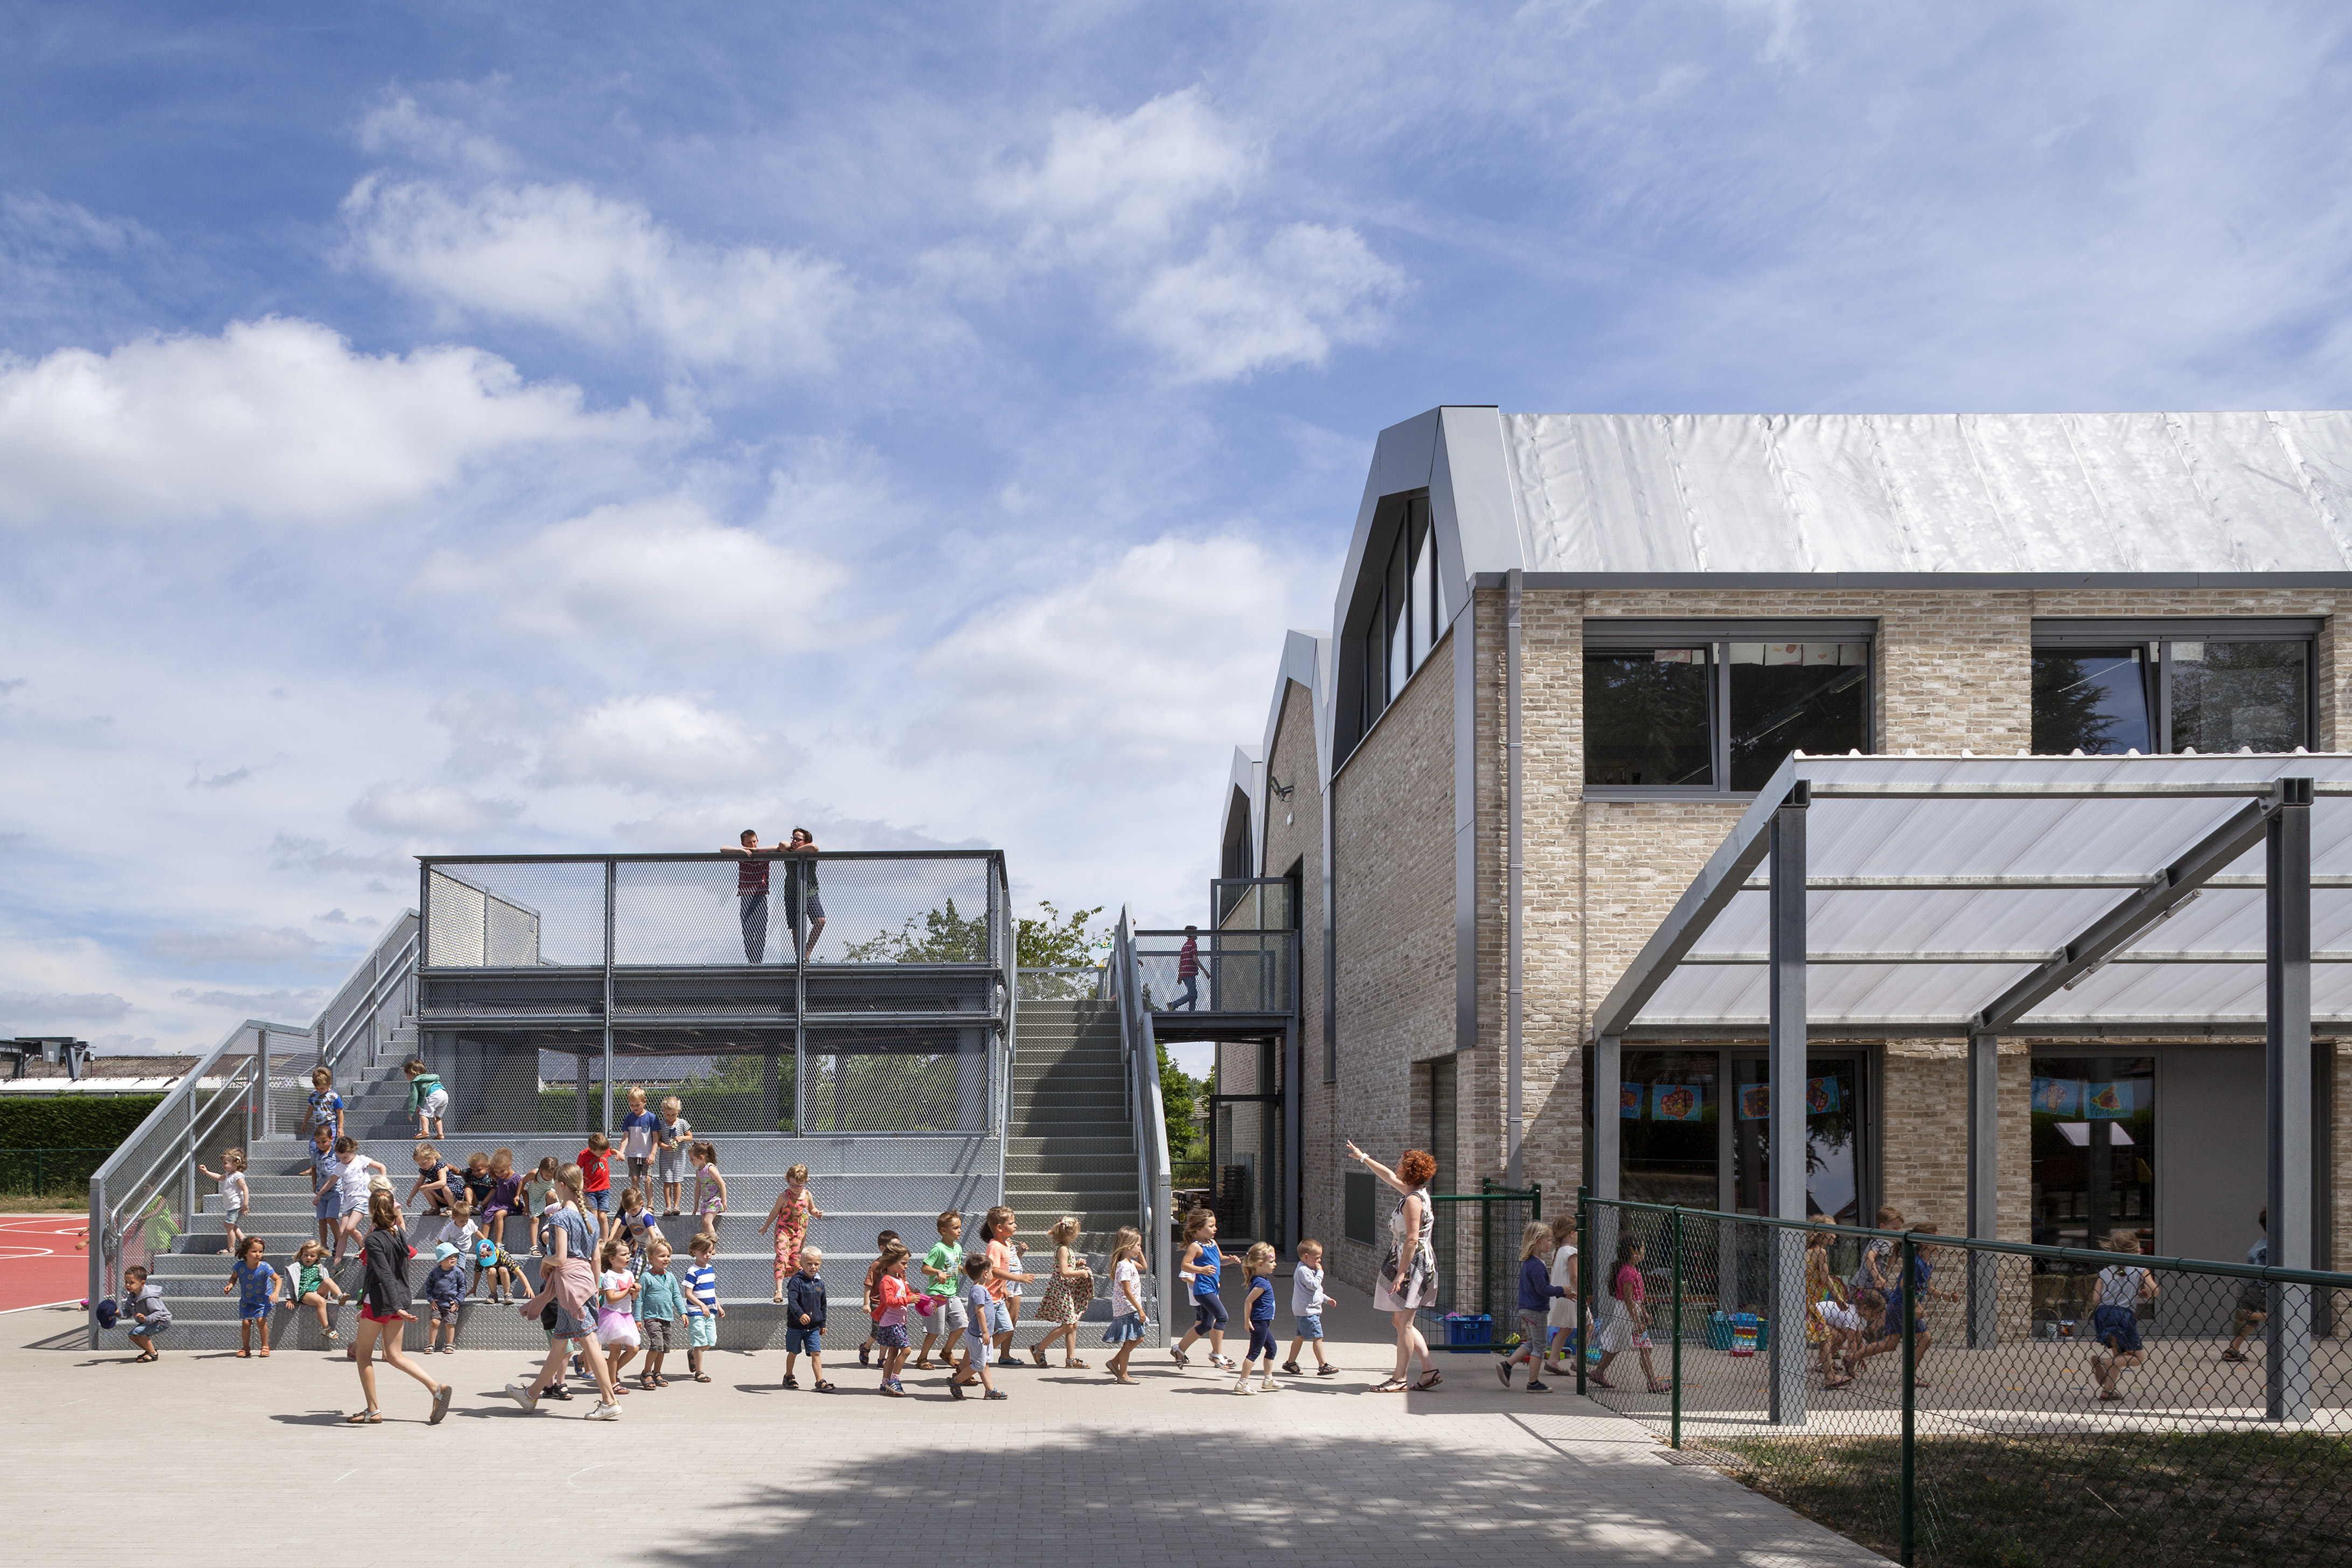 Marlies Rohmer, Basisschool de Zandloper, Zomergem, Belgi??, 2017